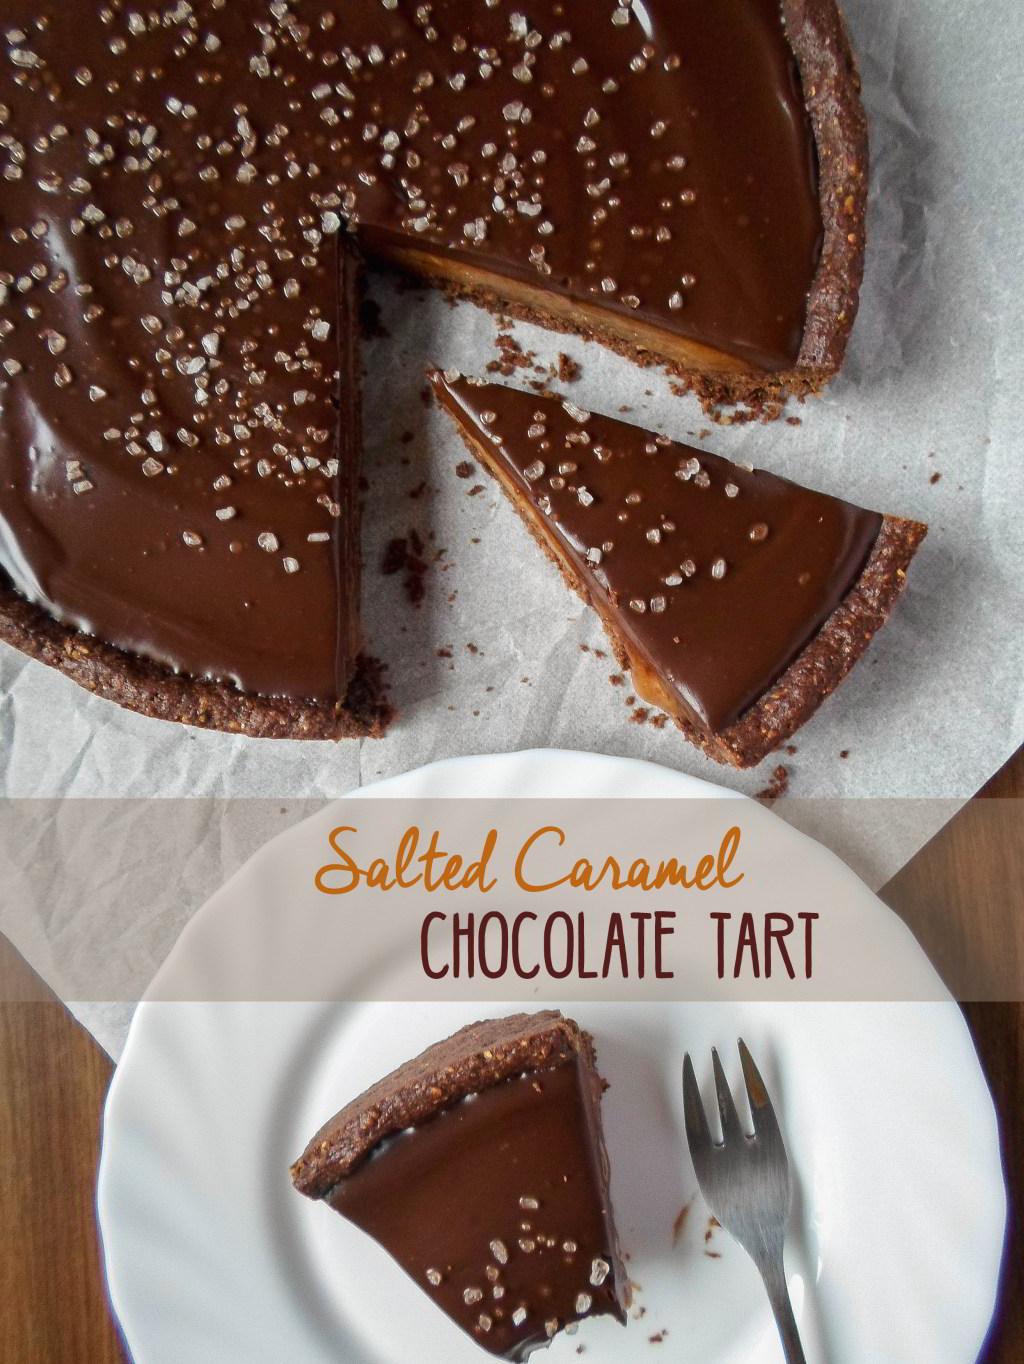 Čokoladni tart sa slanom karamelom